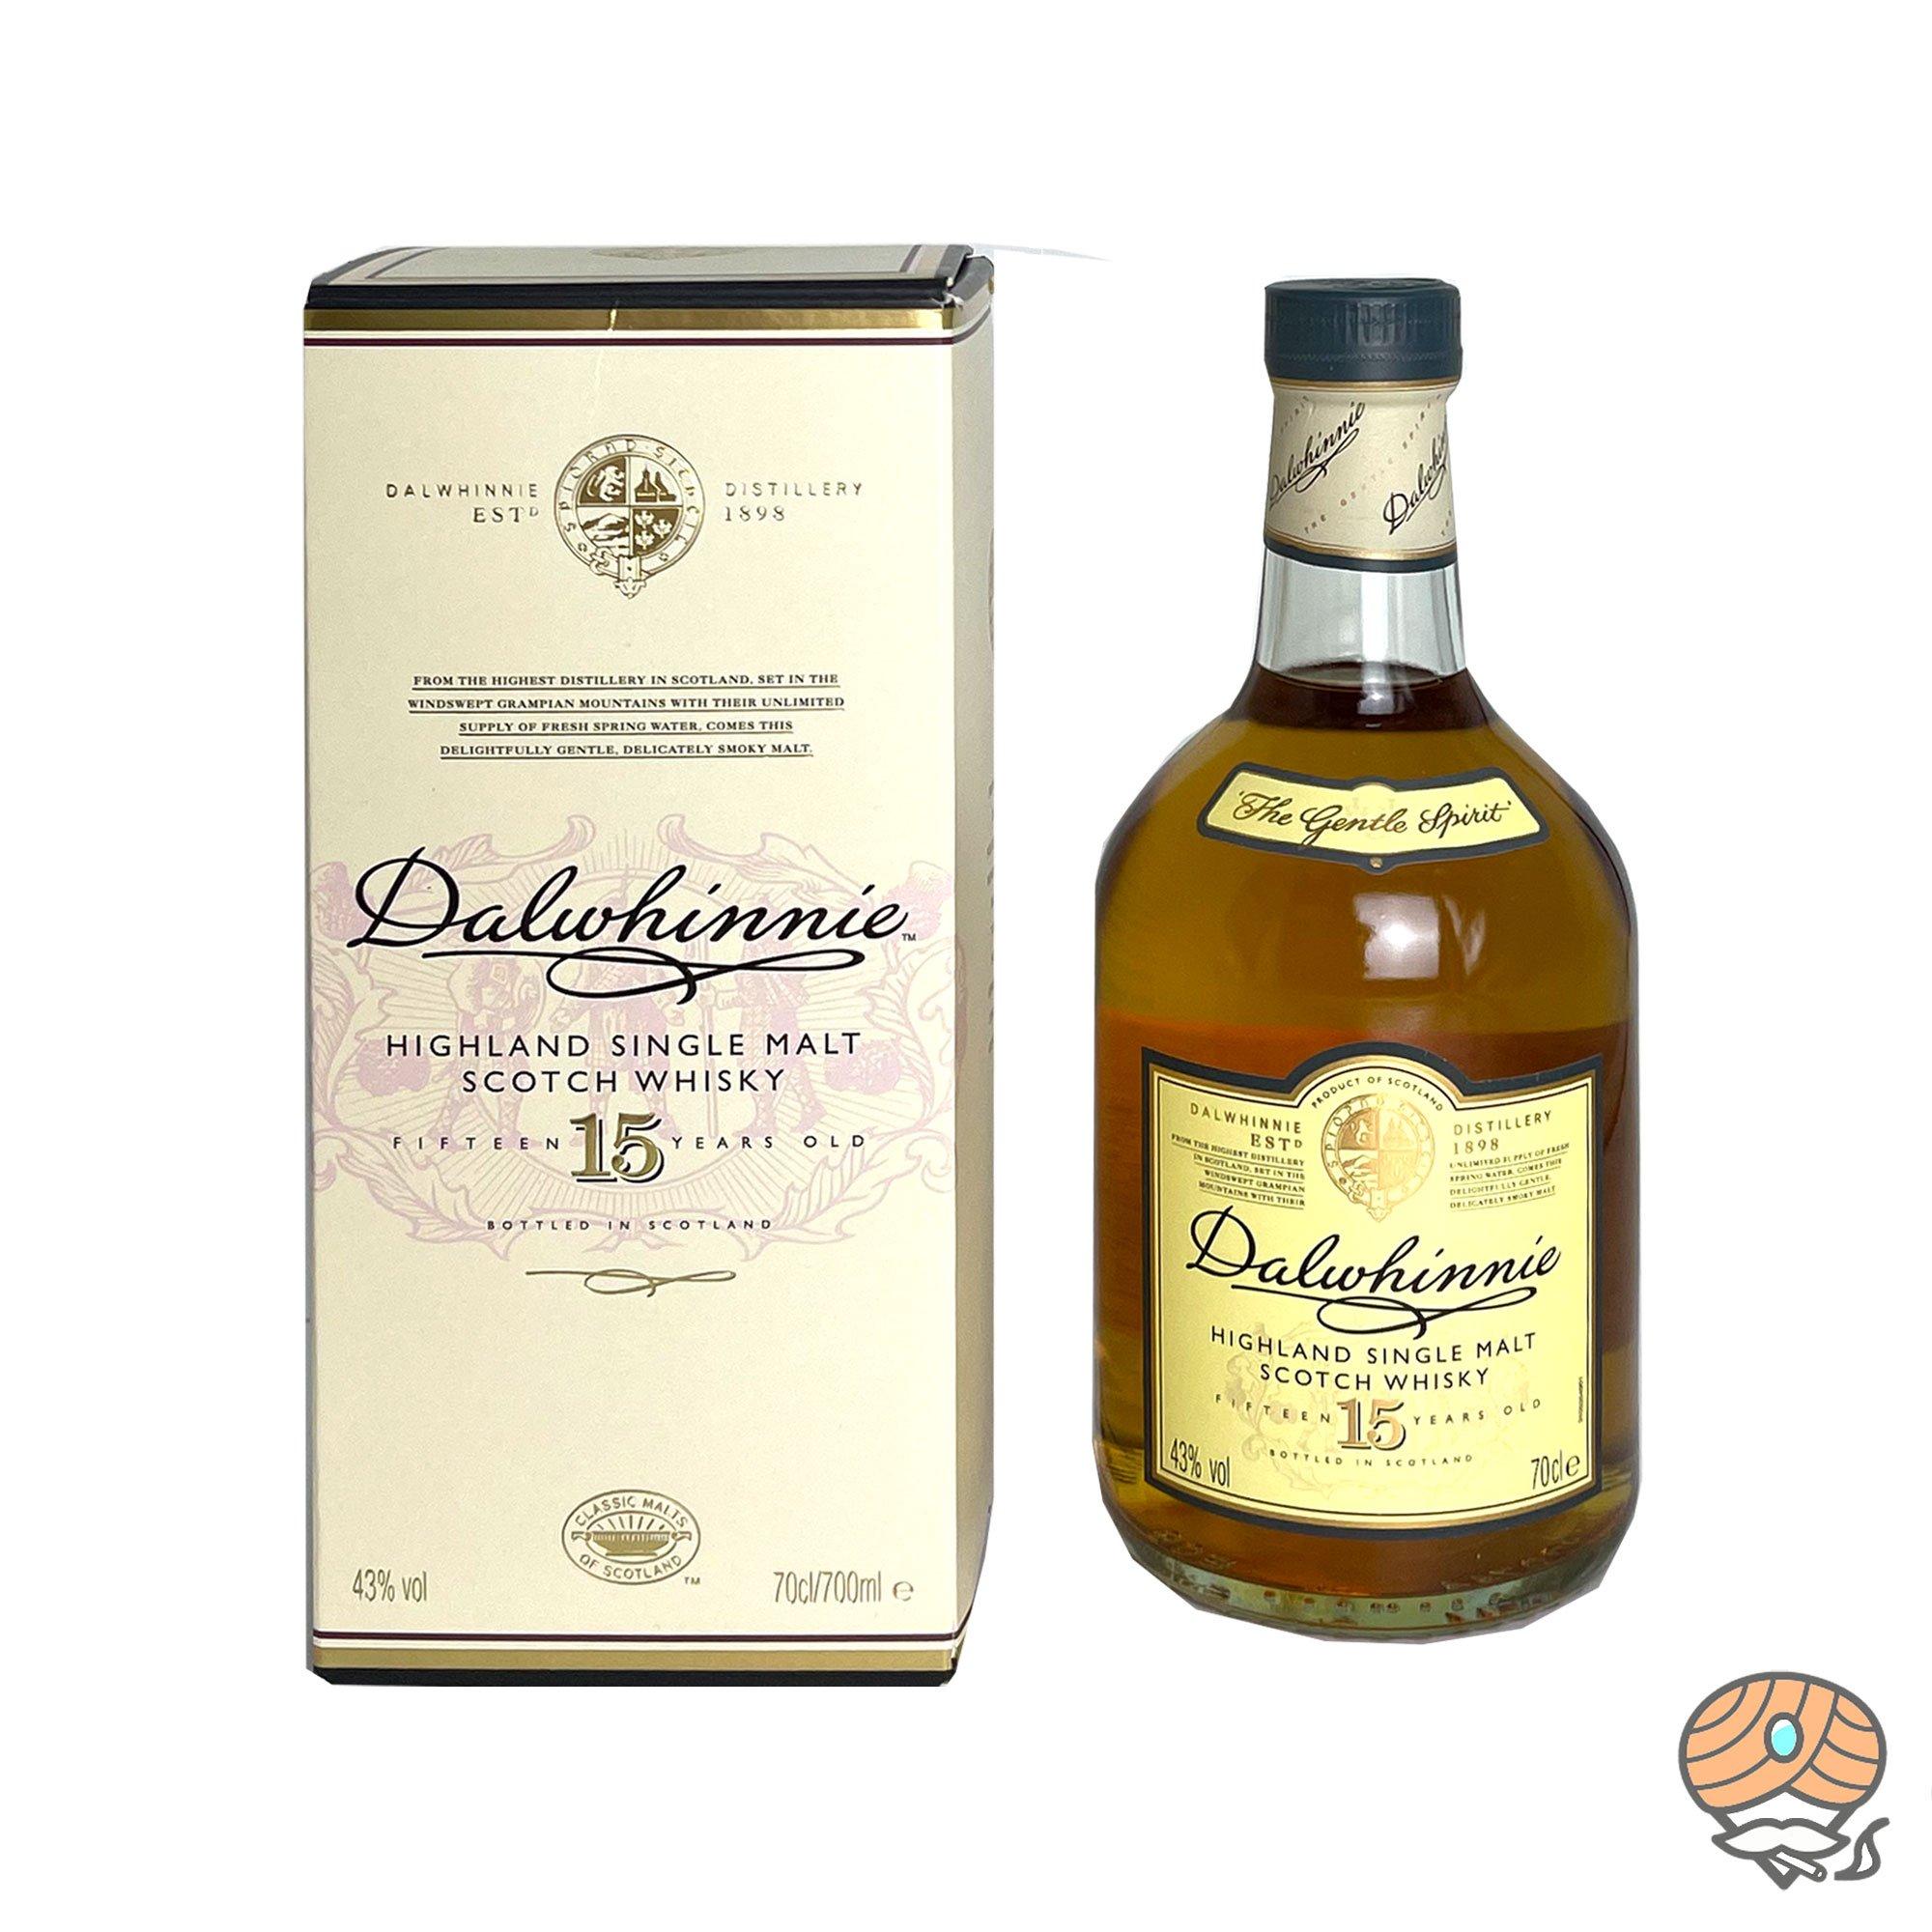 Dalwhinnie Highland Single Malt Scotch Whisky 15 Jahre